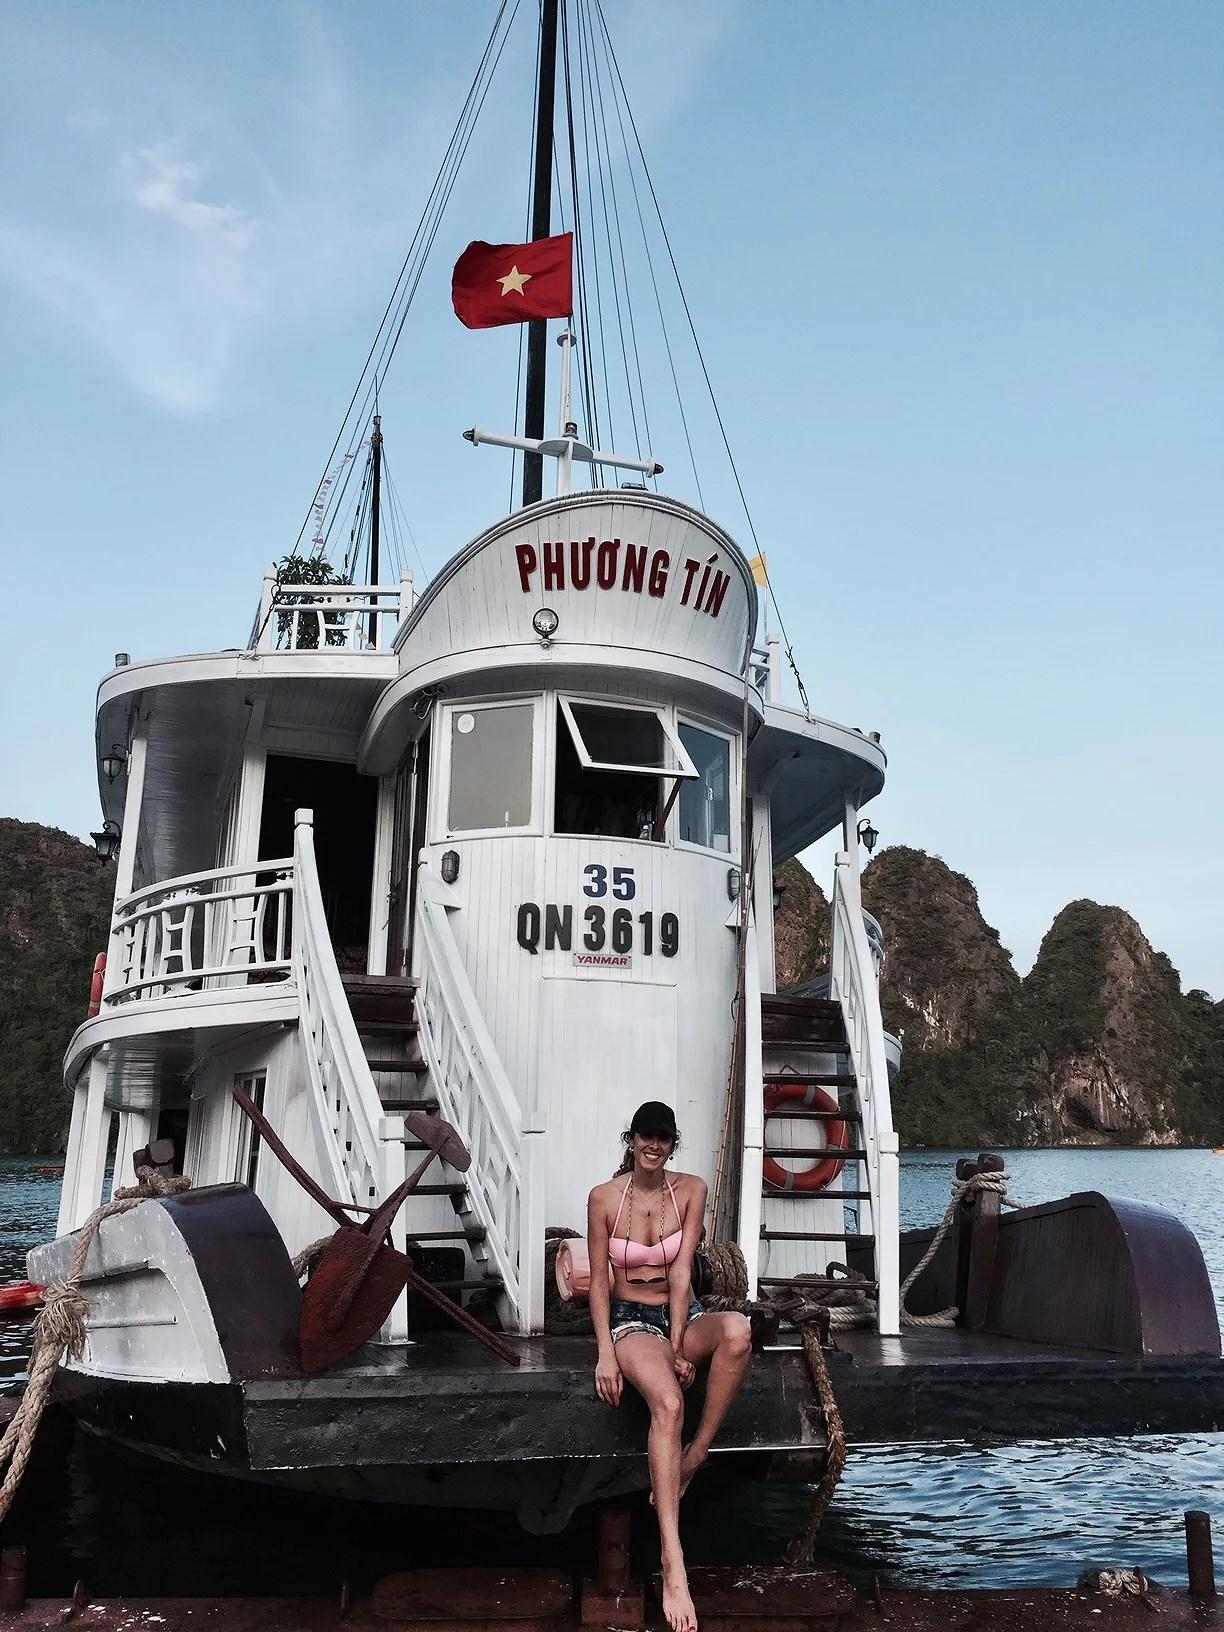 Mi Viaje a Vietnam II: Halong Bay y Hoi An